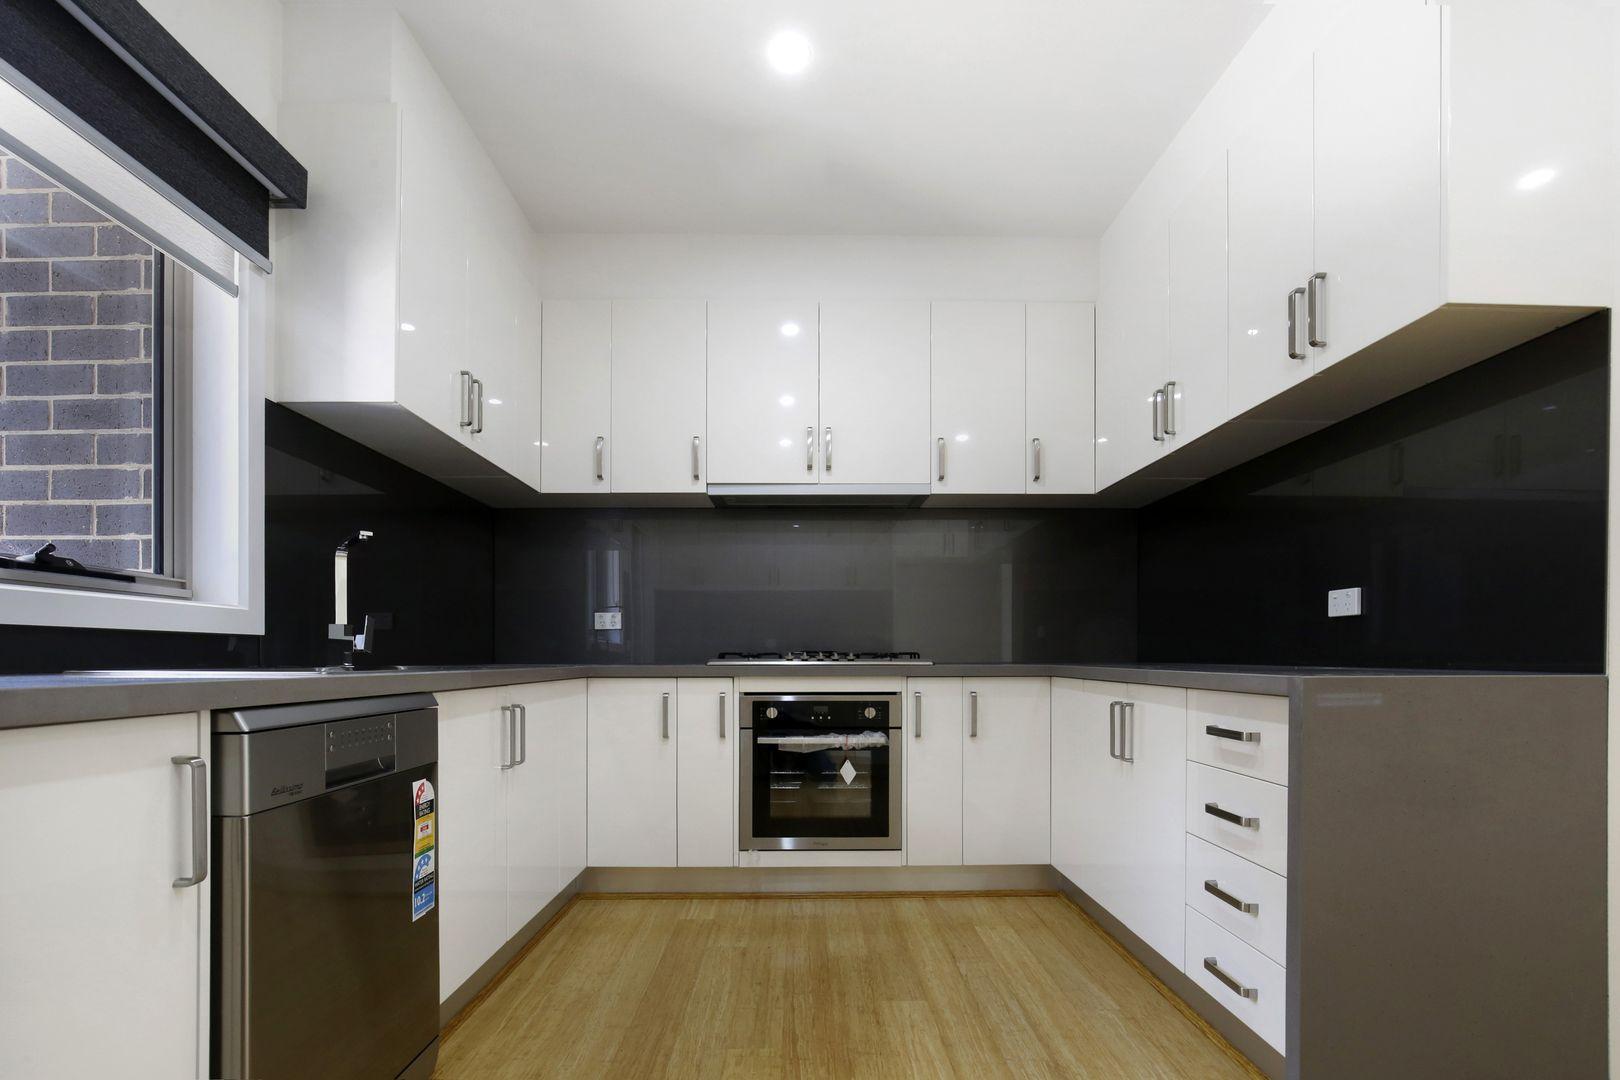 1/118 Nell Street, Greensborough VIC 3088, Image 1